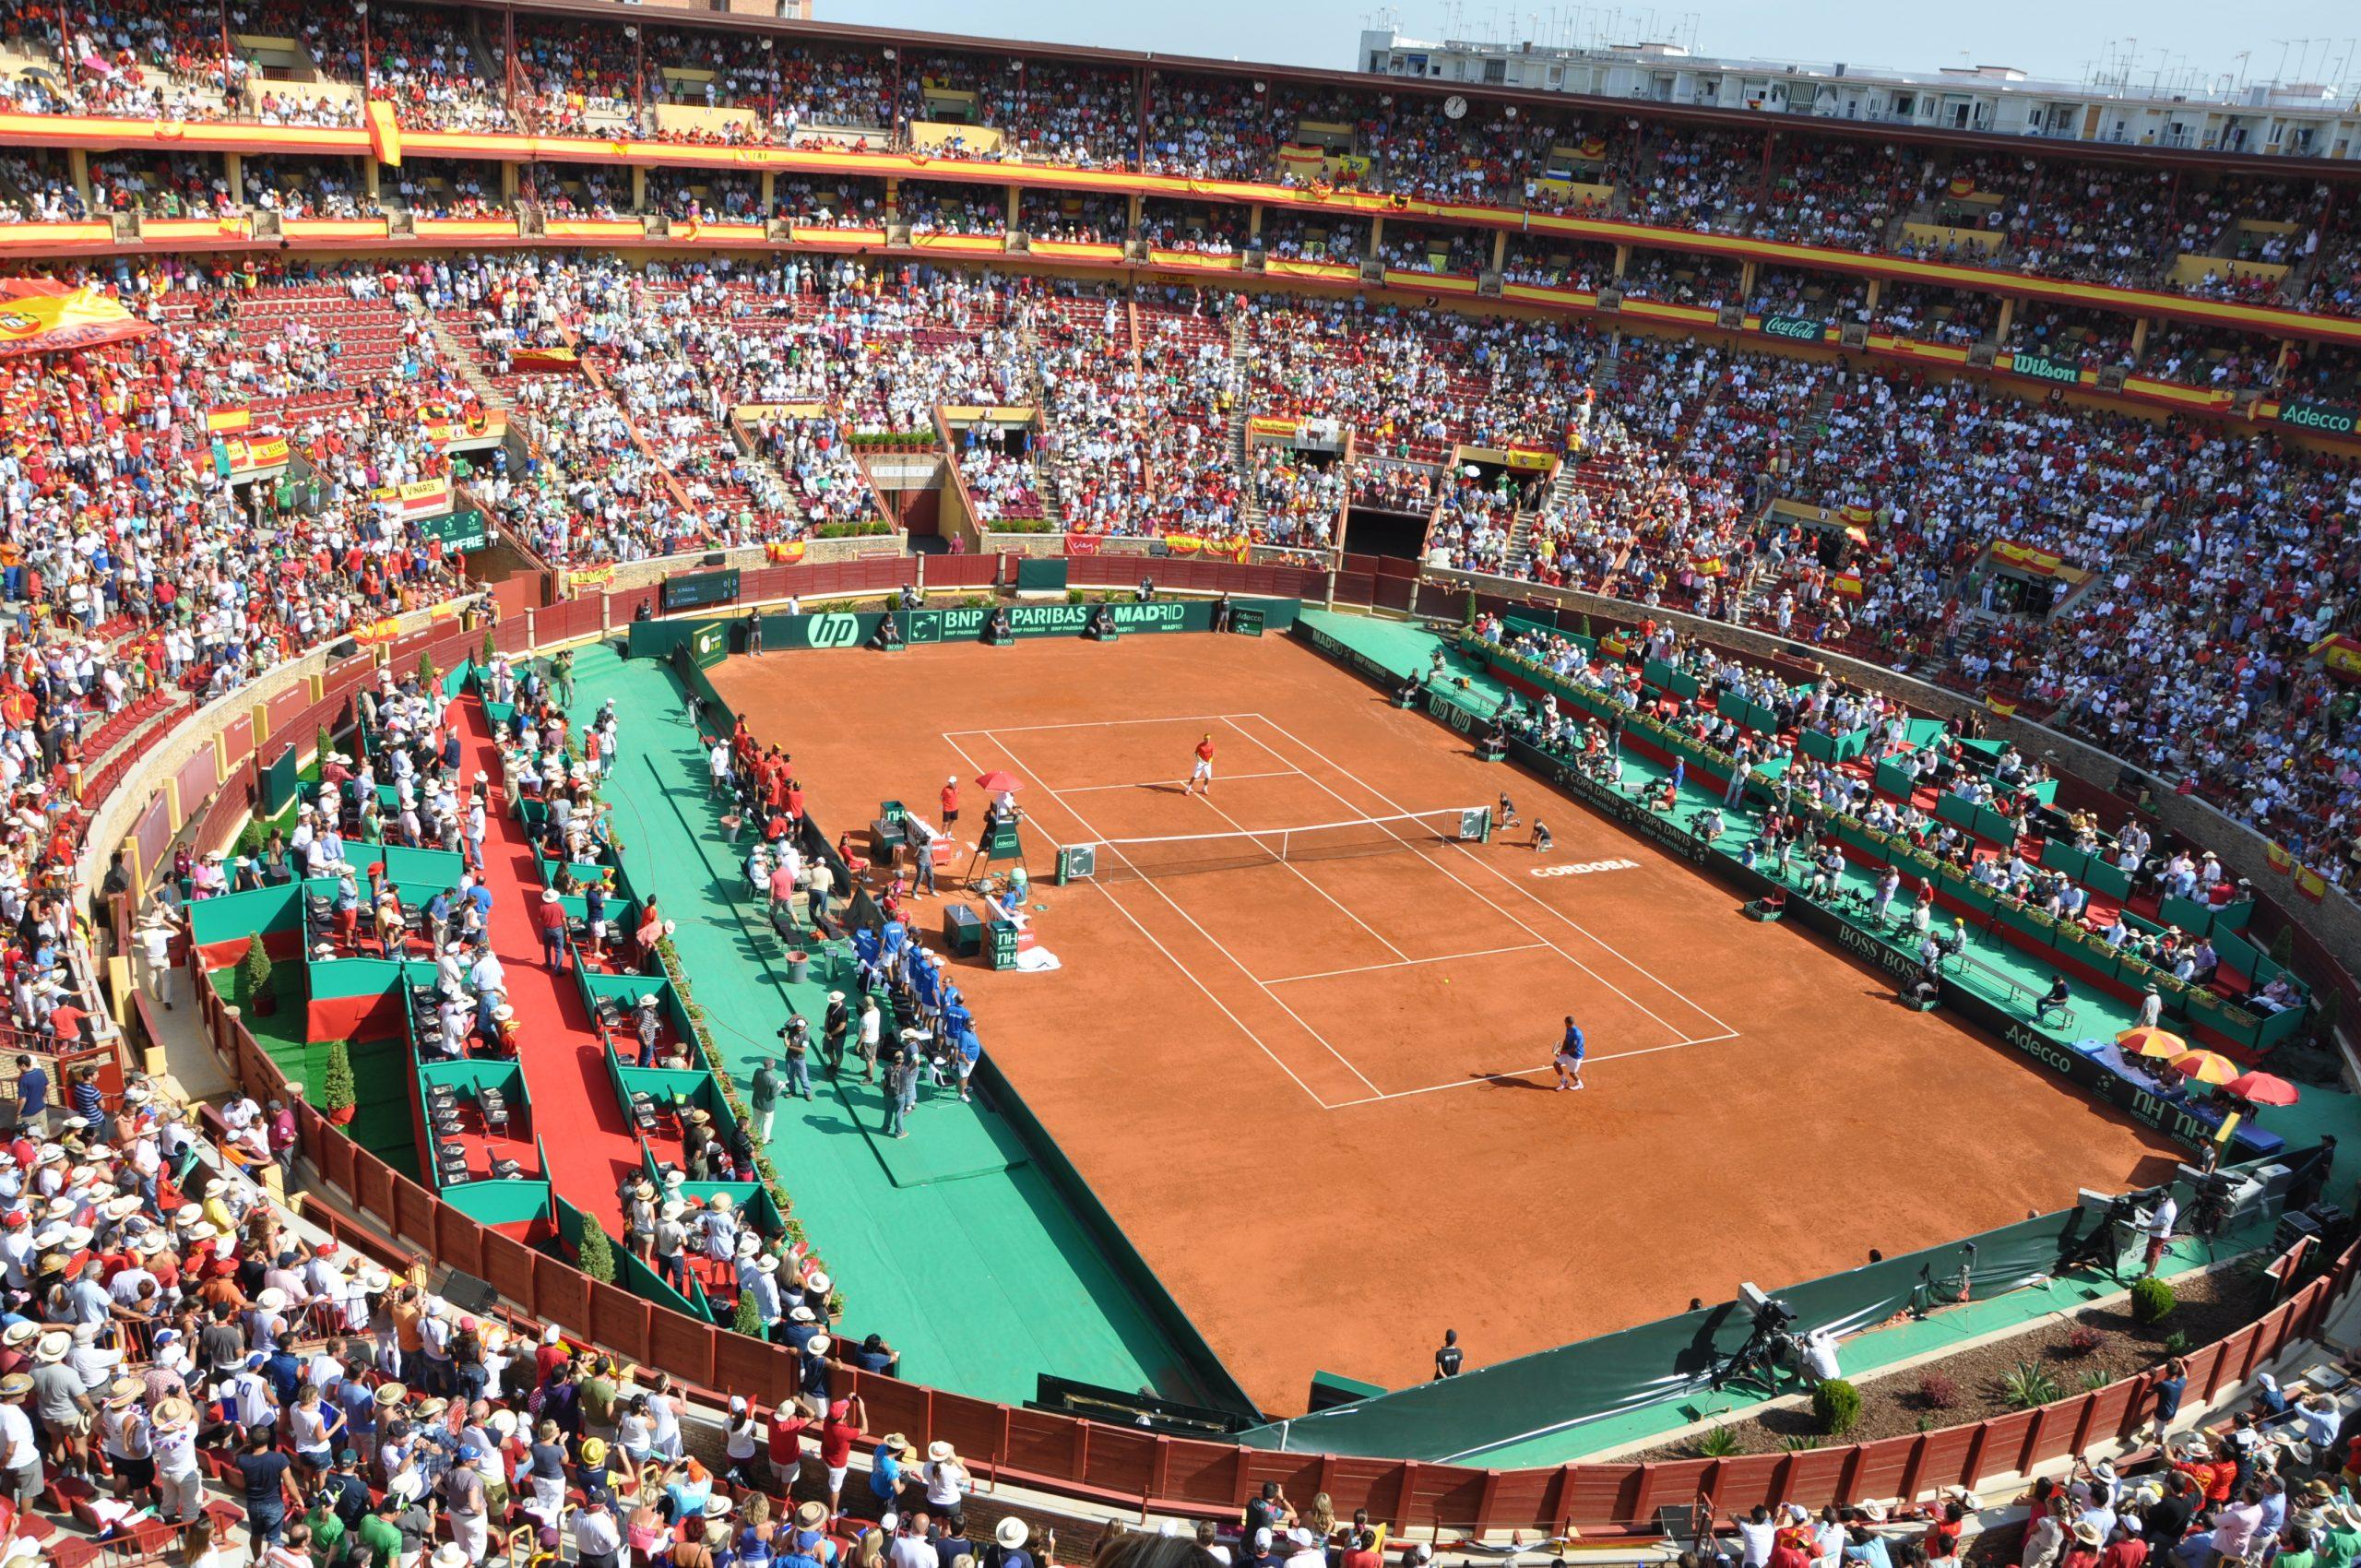 construccion pista tenis copa davis cordoba